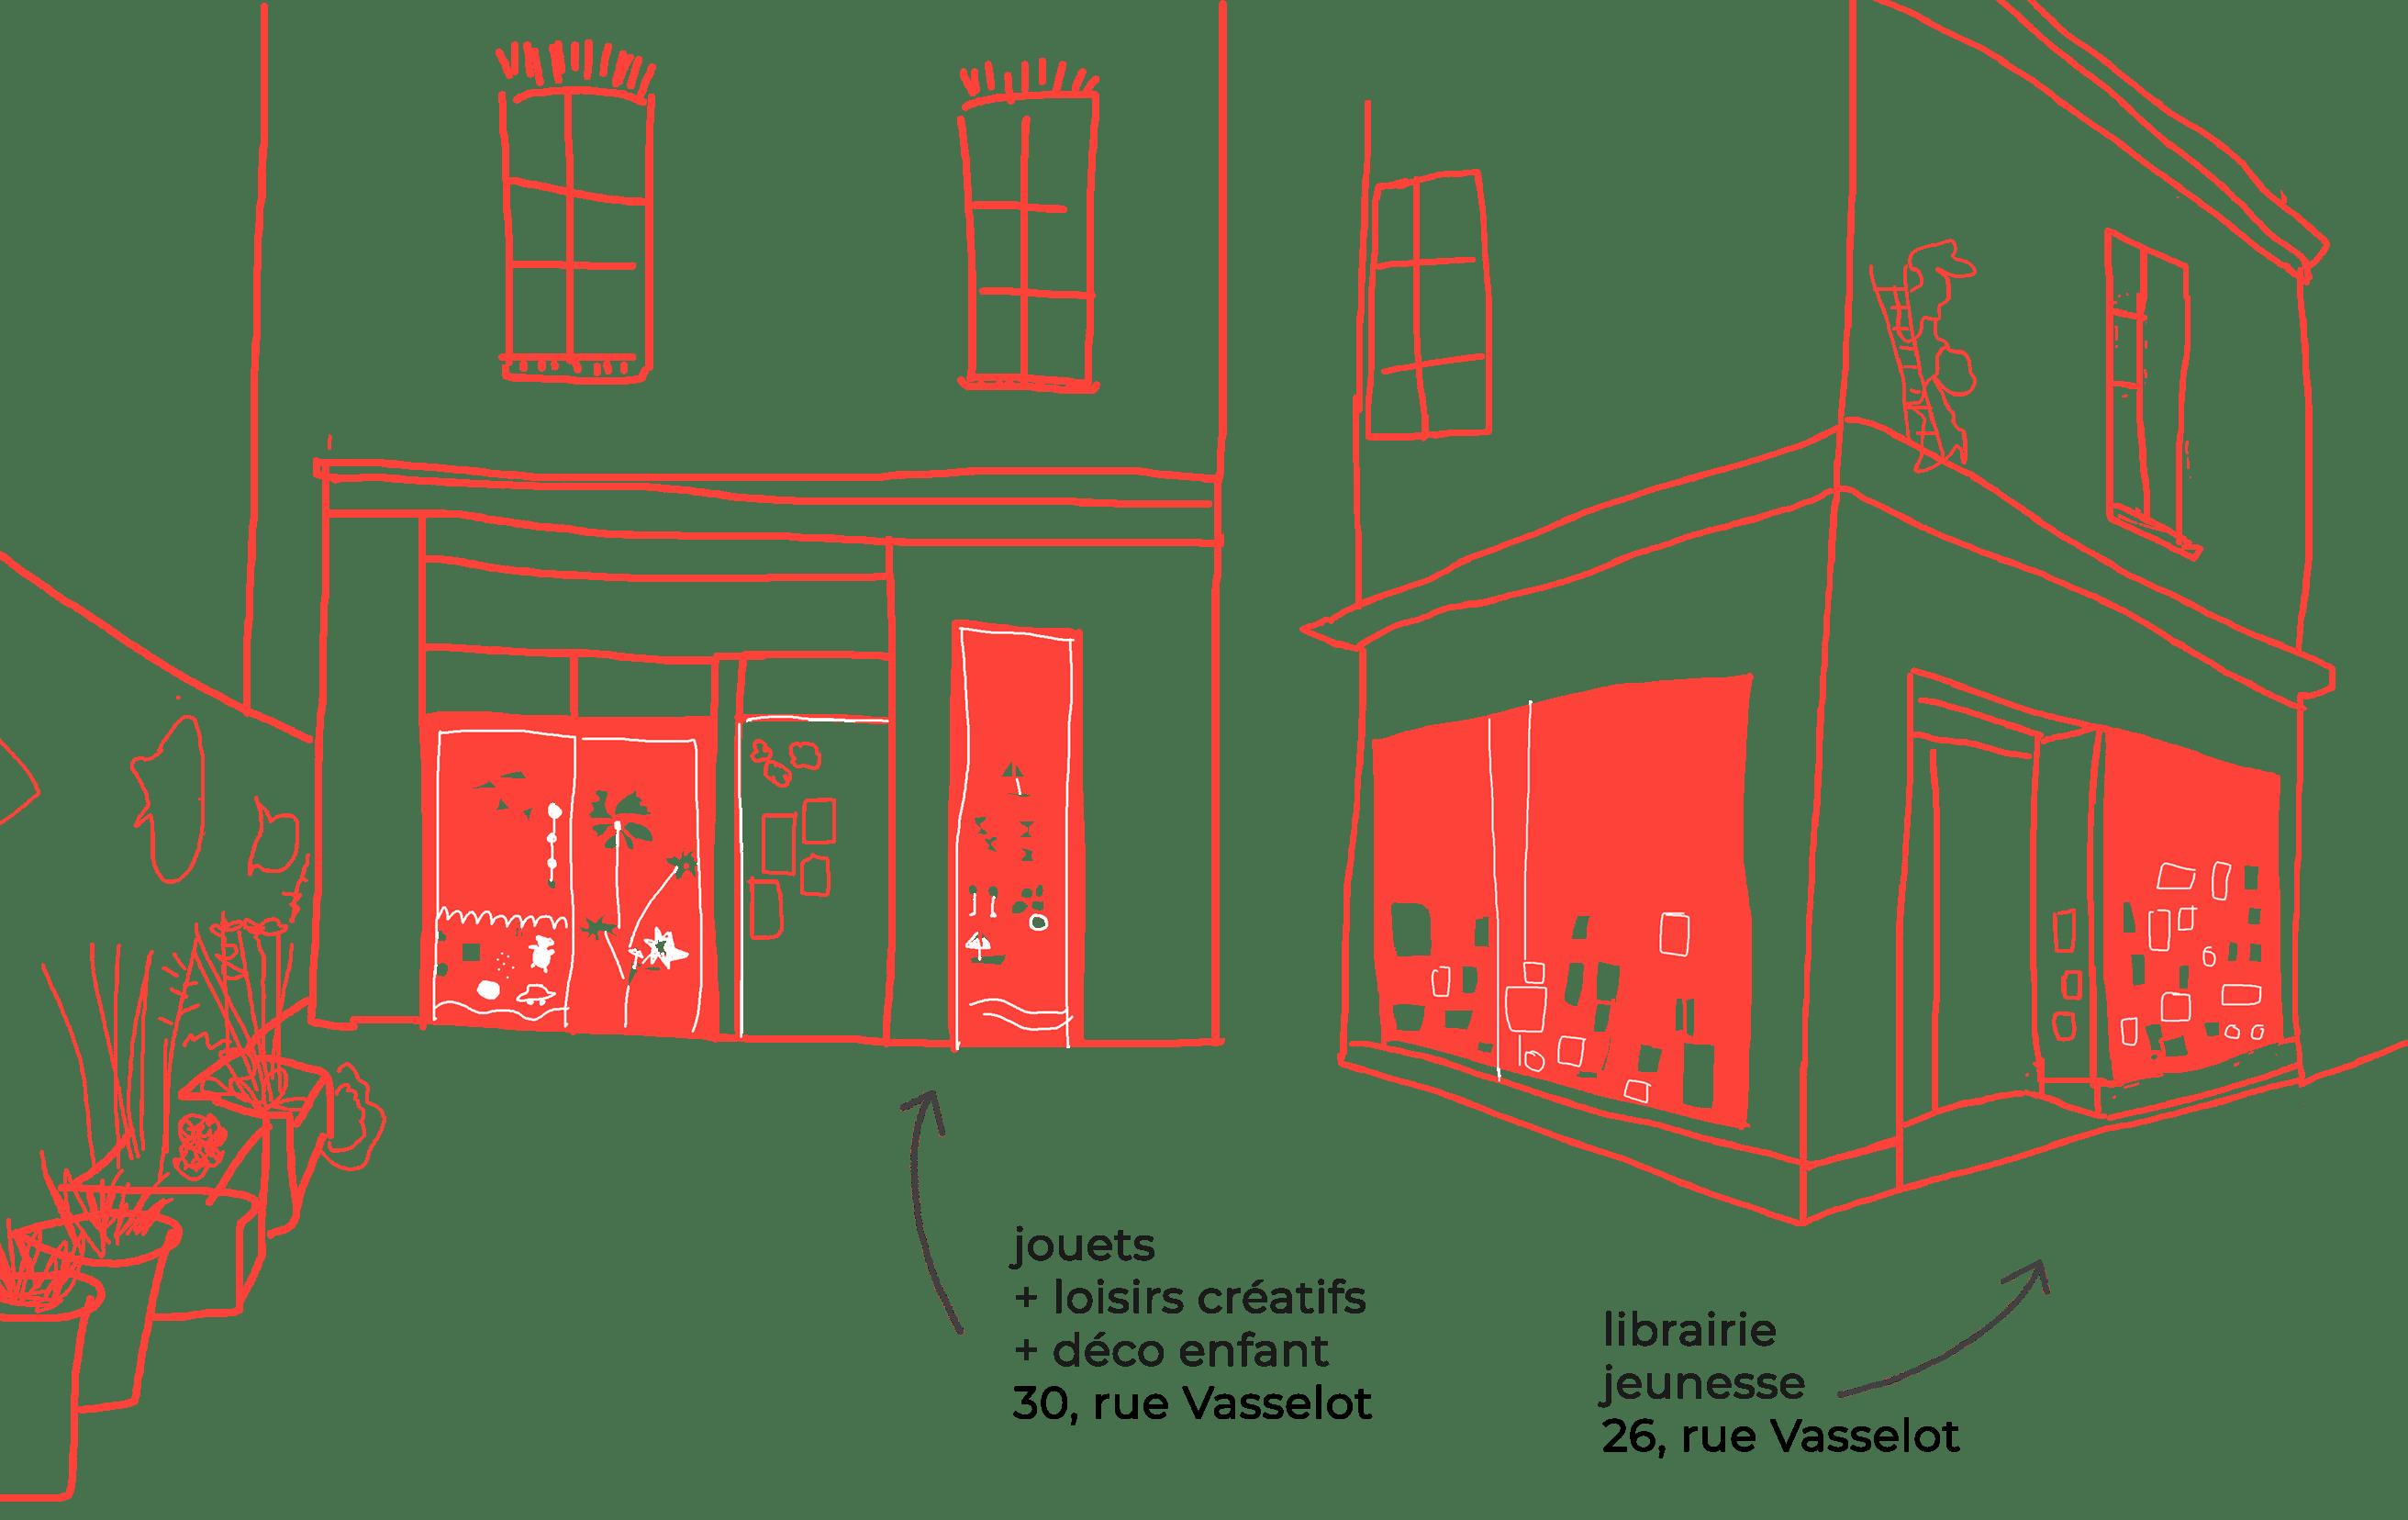 La Courte Echelle, 26-30 rue Vasselot, Rennes